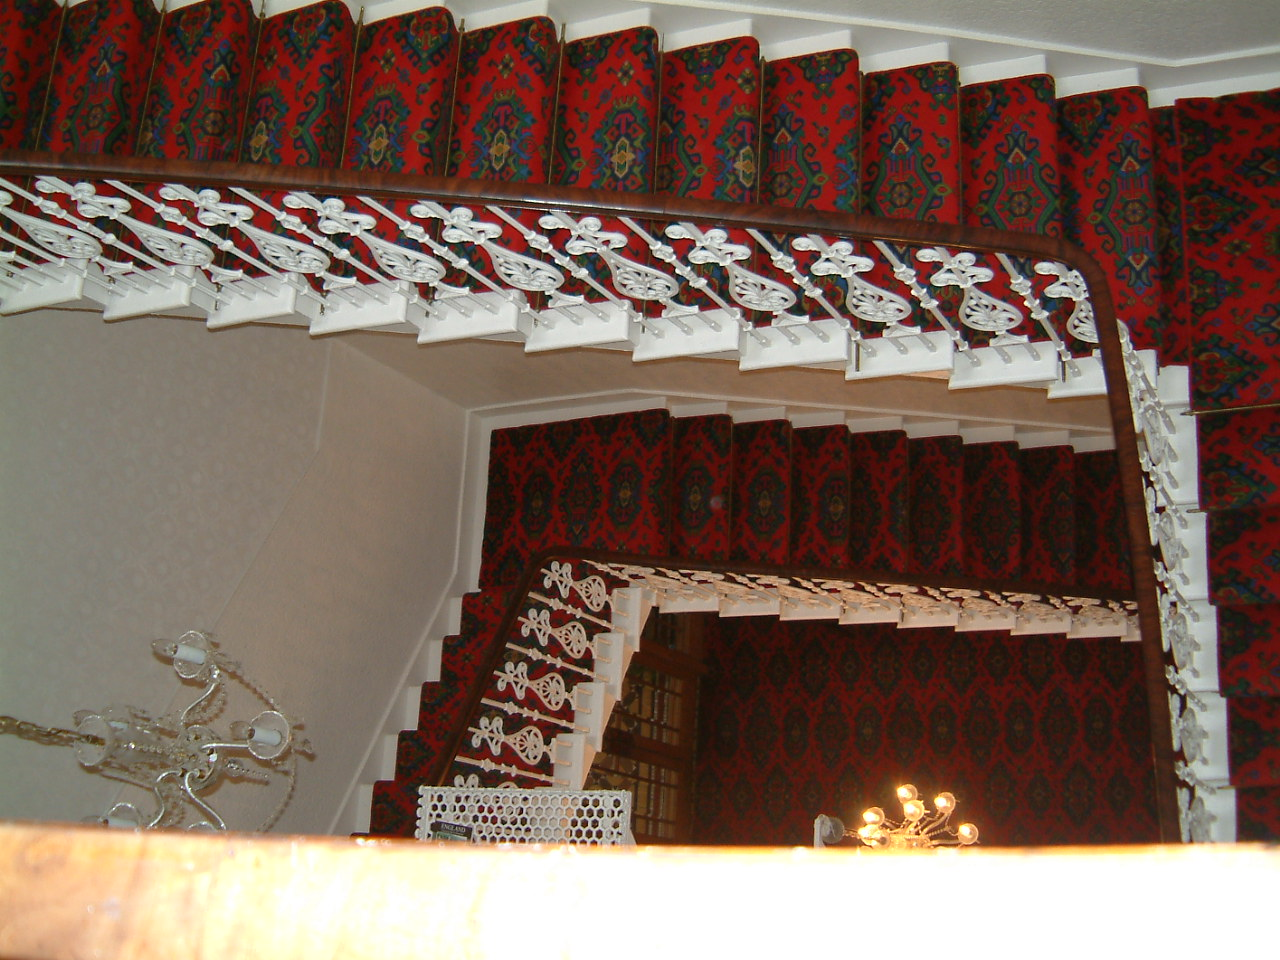 The terrace hotel webgallery for 37 royal terrace edinburgh eh7 5ah